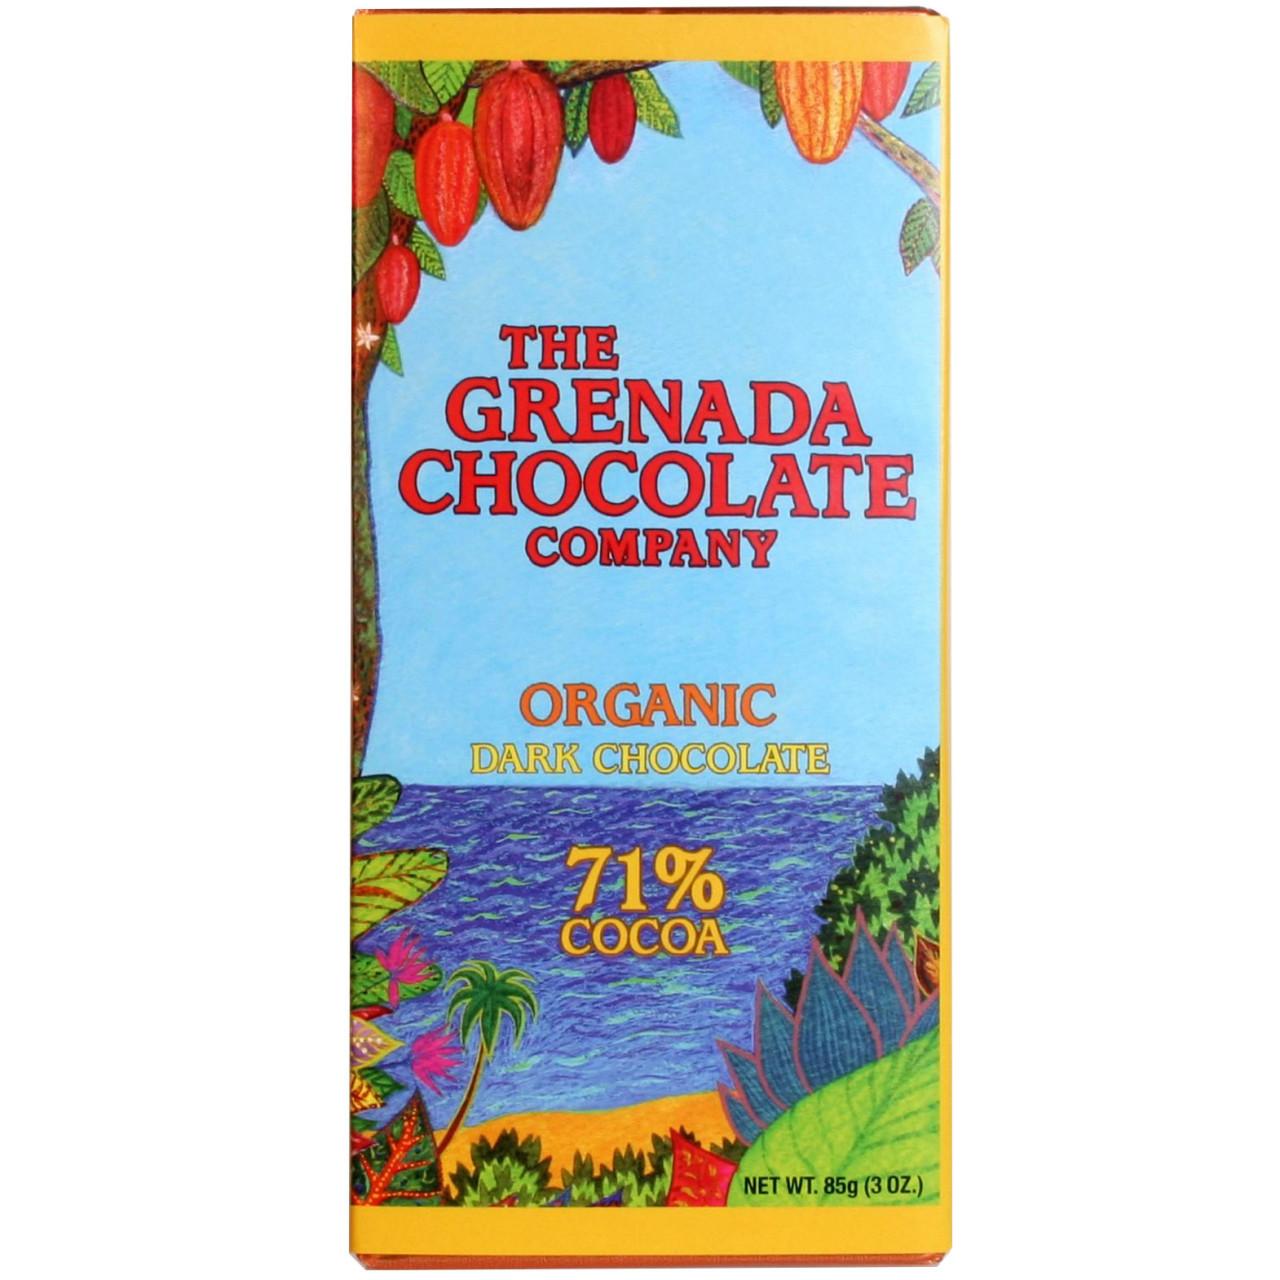 Bio Schokolade, Organic, Grenada, dark chocolate, dunkle Schokolade, chocolat noir, cocoa cacao,